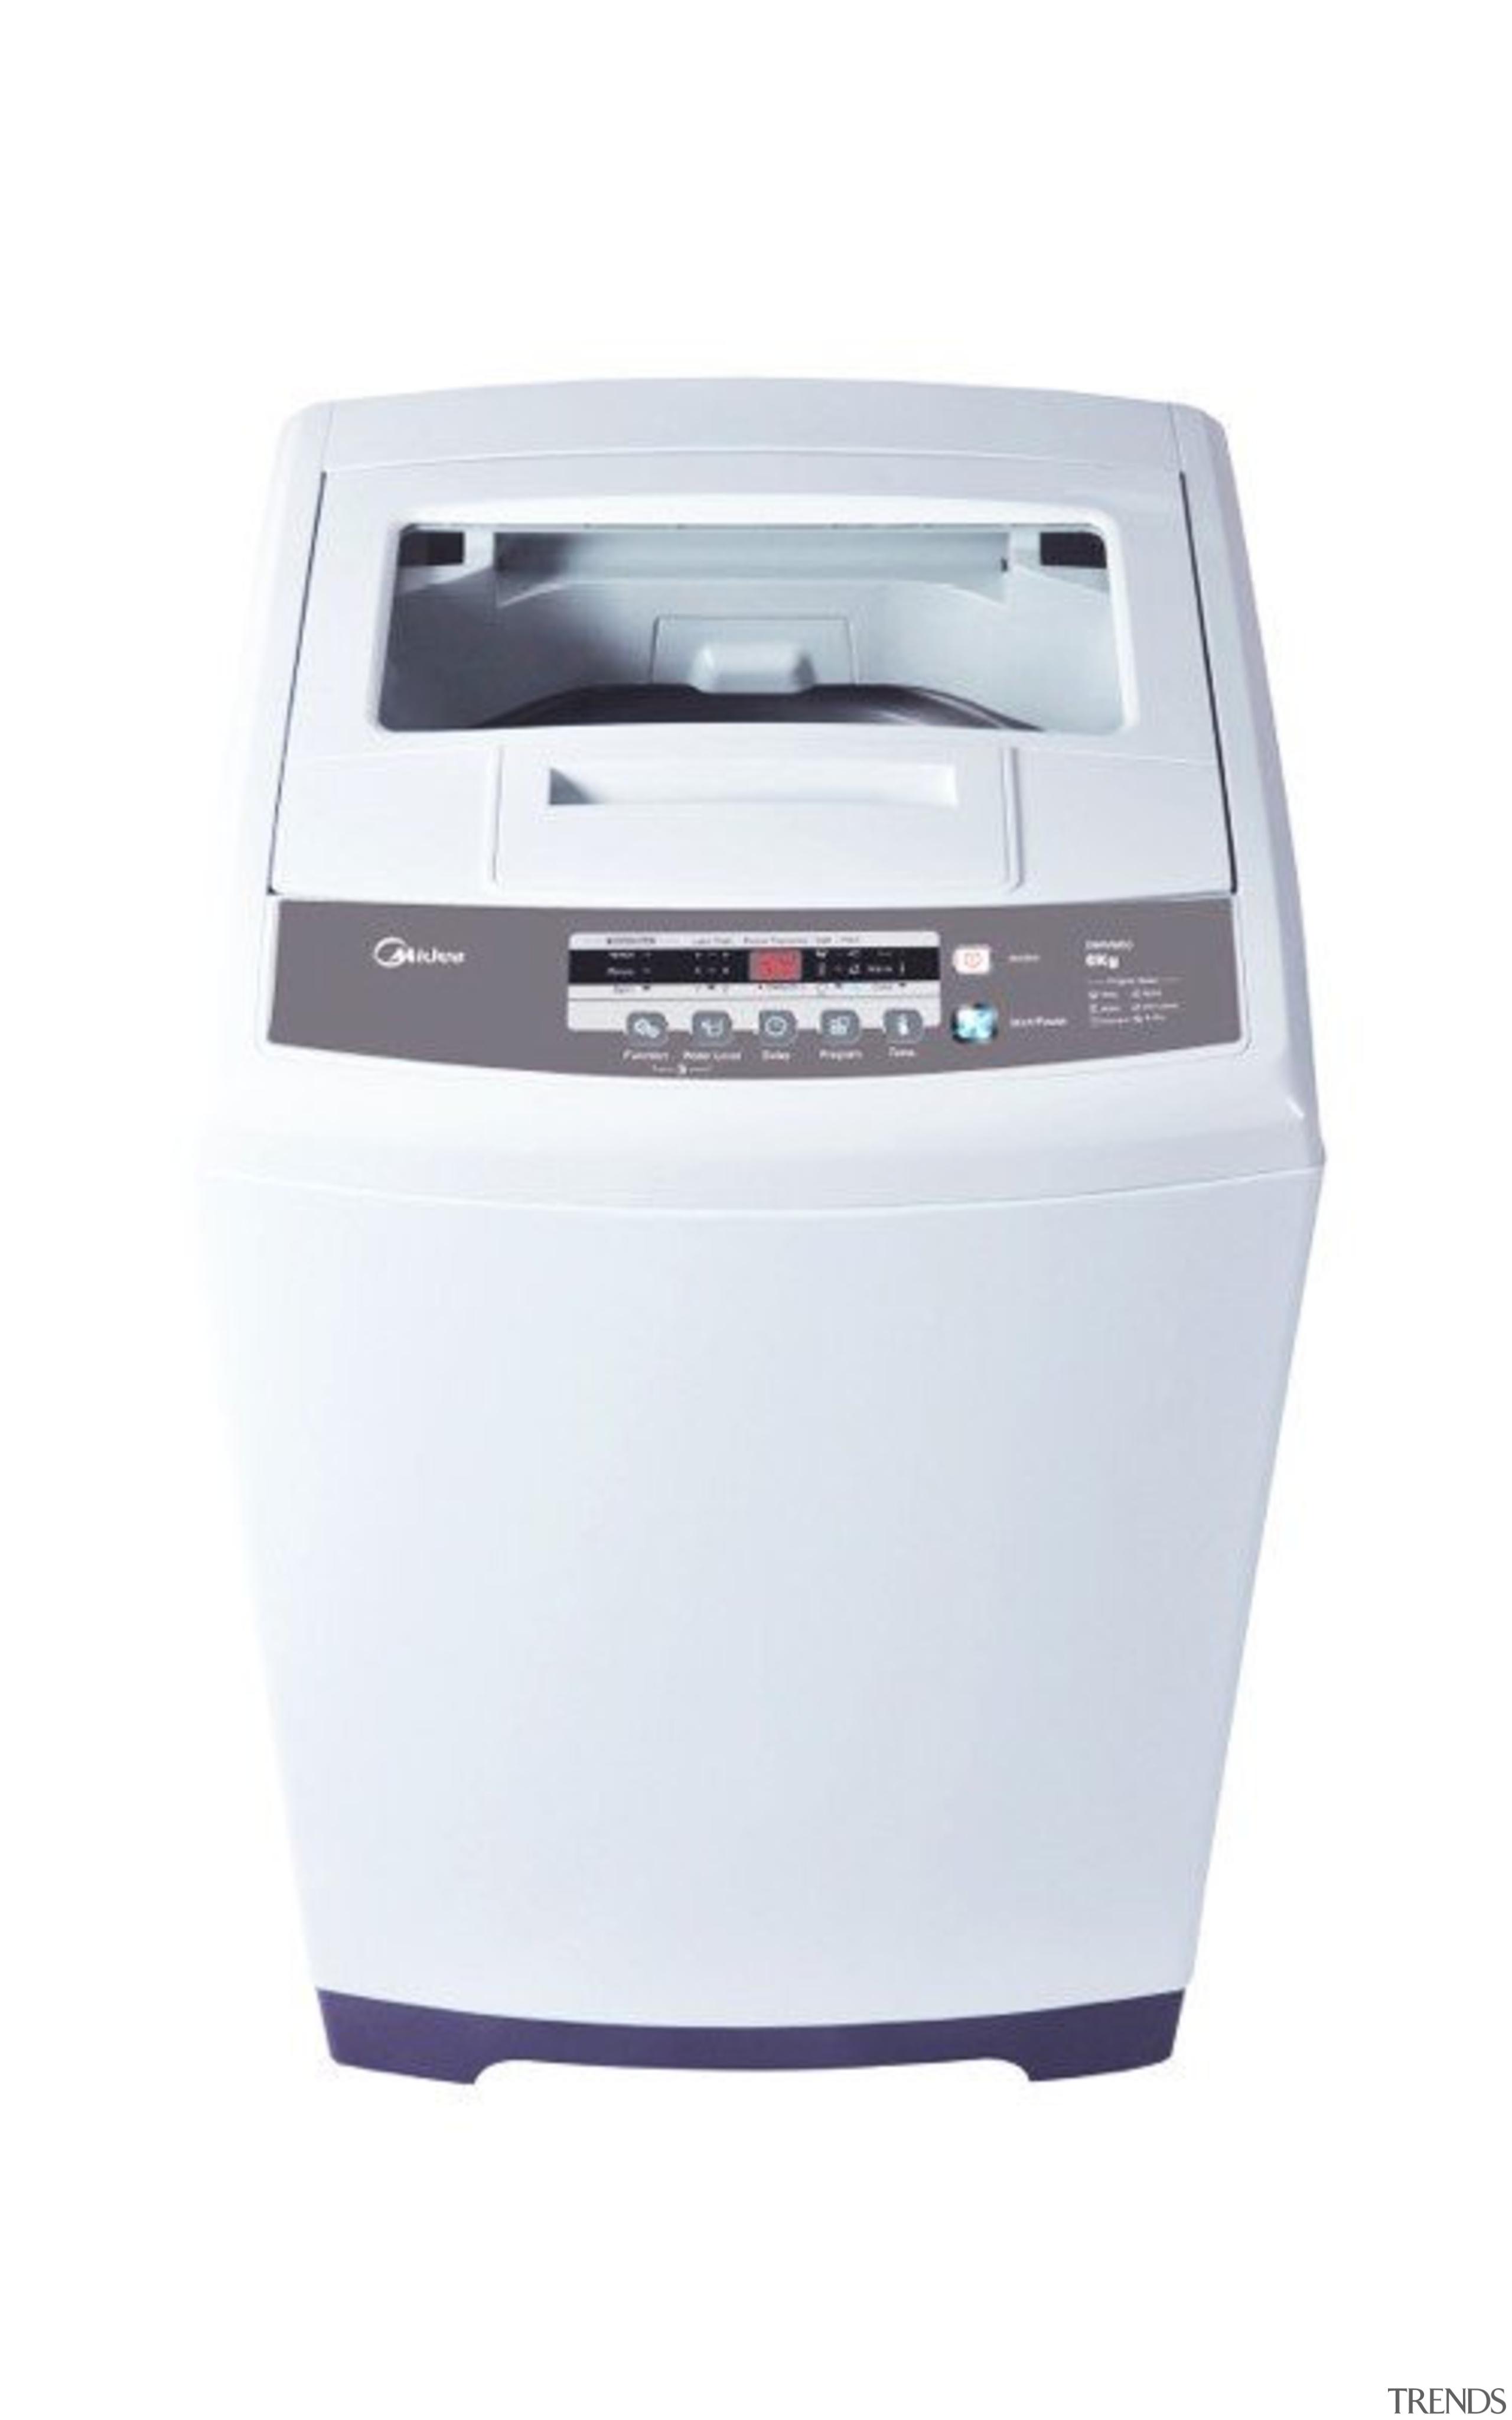 6 Kg Top Load Washing MachineCapacity: 6Kg6 Programs, home appliance, laser printing, major appliance, product, washing machine, white